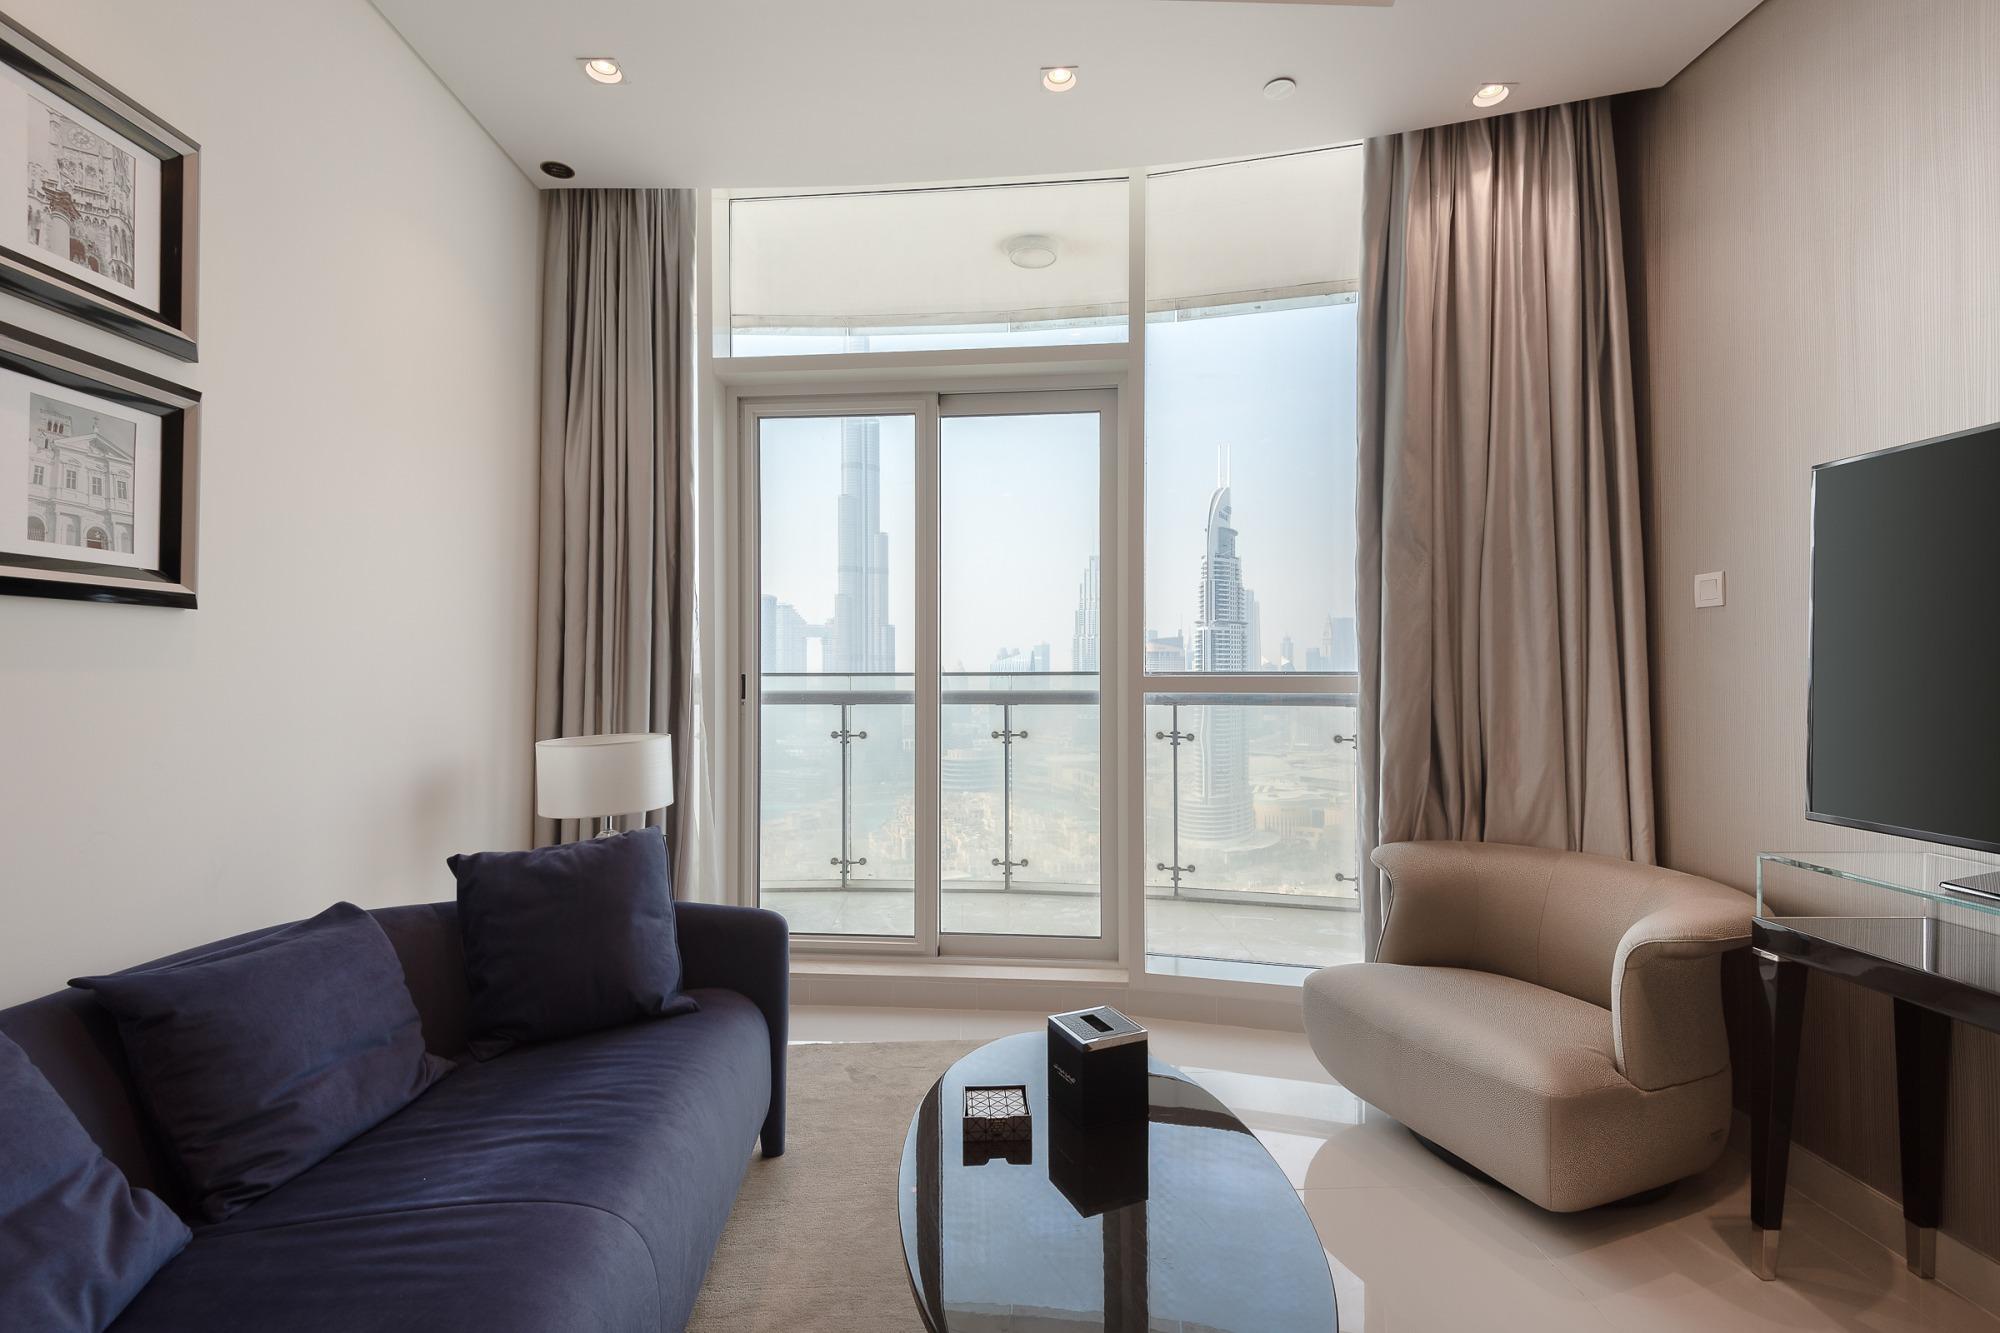 2 Bed Burj Khalifa view |High floor|Fendi design